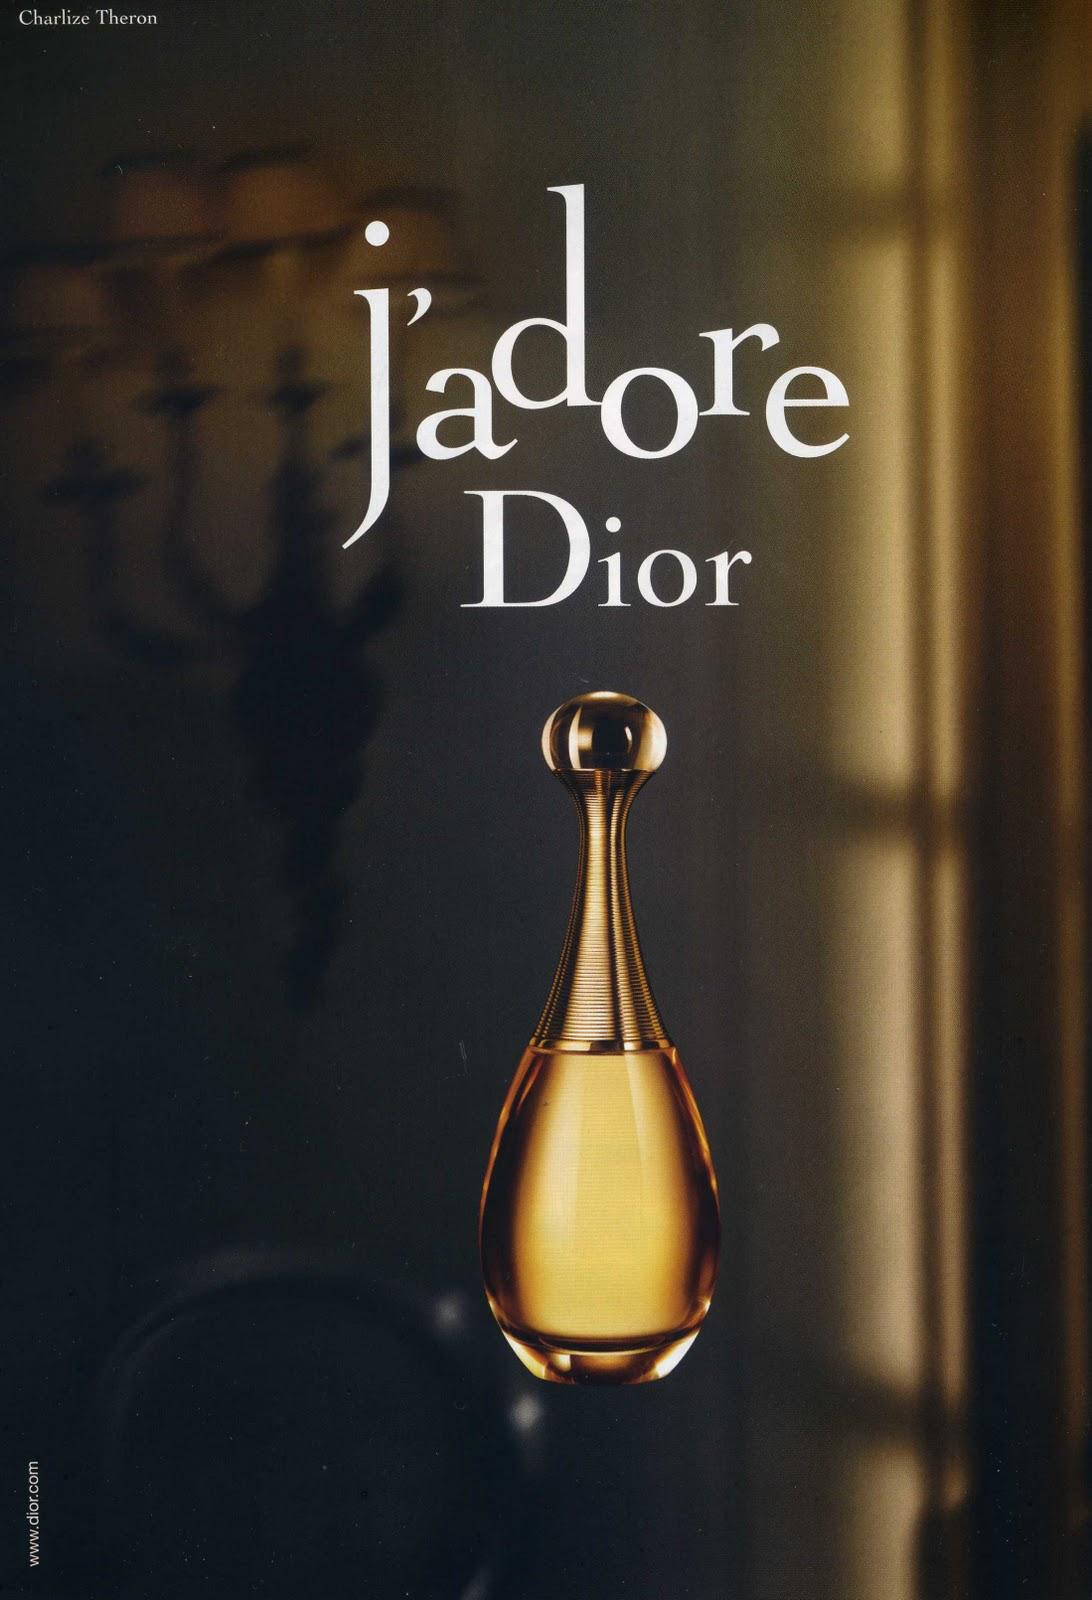 http://3.bp.blogspot.com/-53koWph4GNM/UEeFGfvh5wI/AAAAAAAAArE/v0dOLdhdI2Y/s1600/J\'adore+by+Christian+Dior+for+Women.jpg